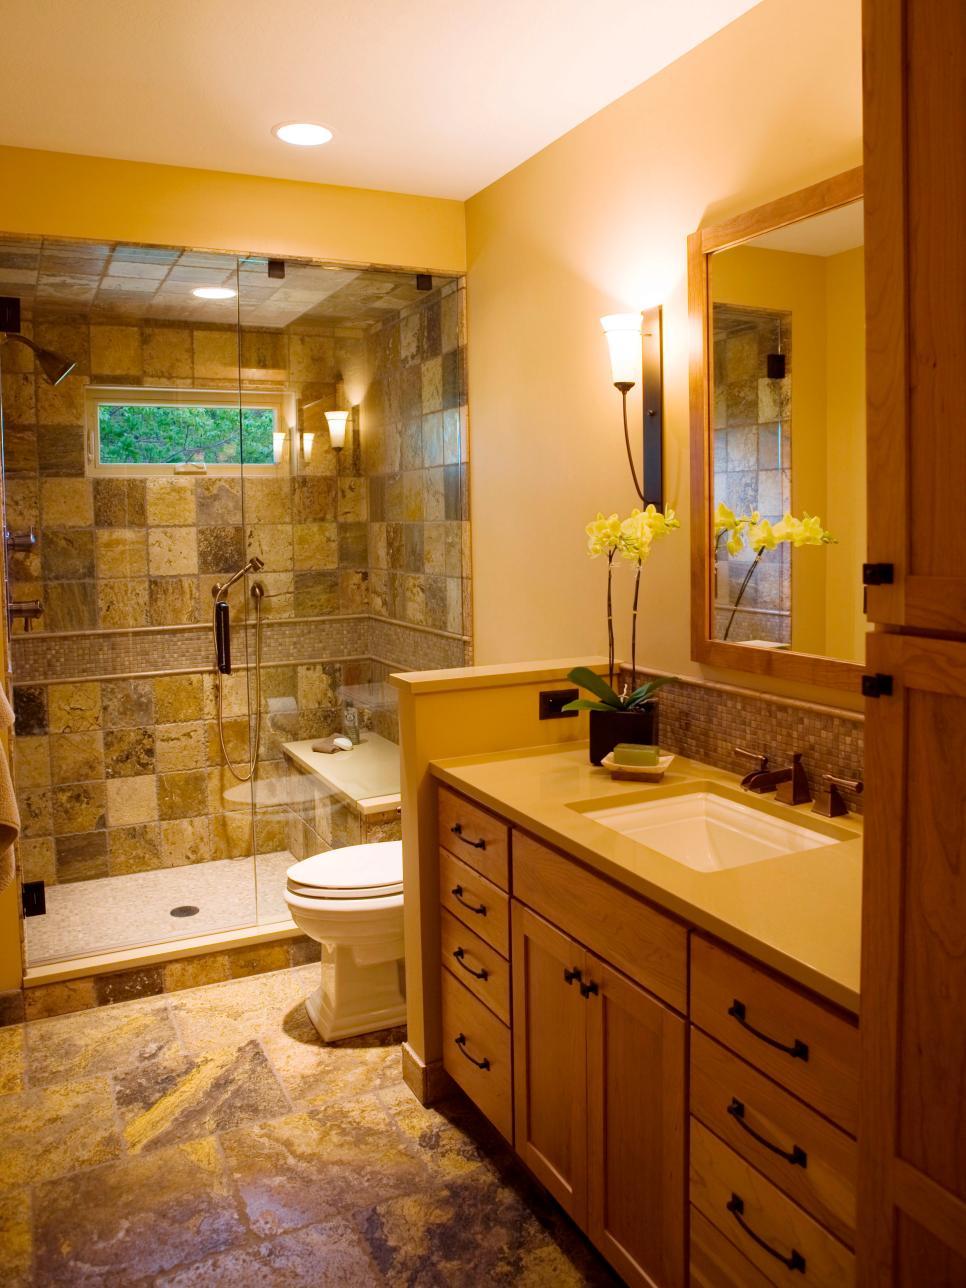 Bathroom Types In Photos